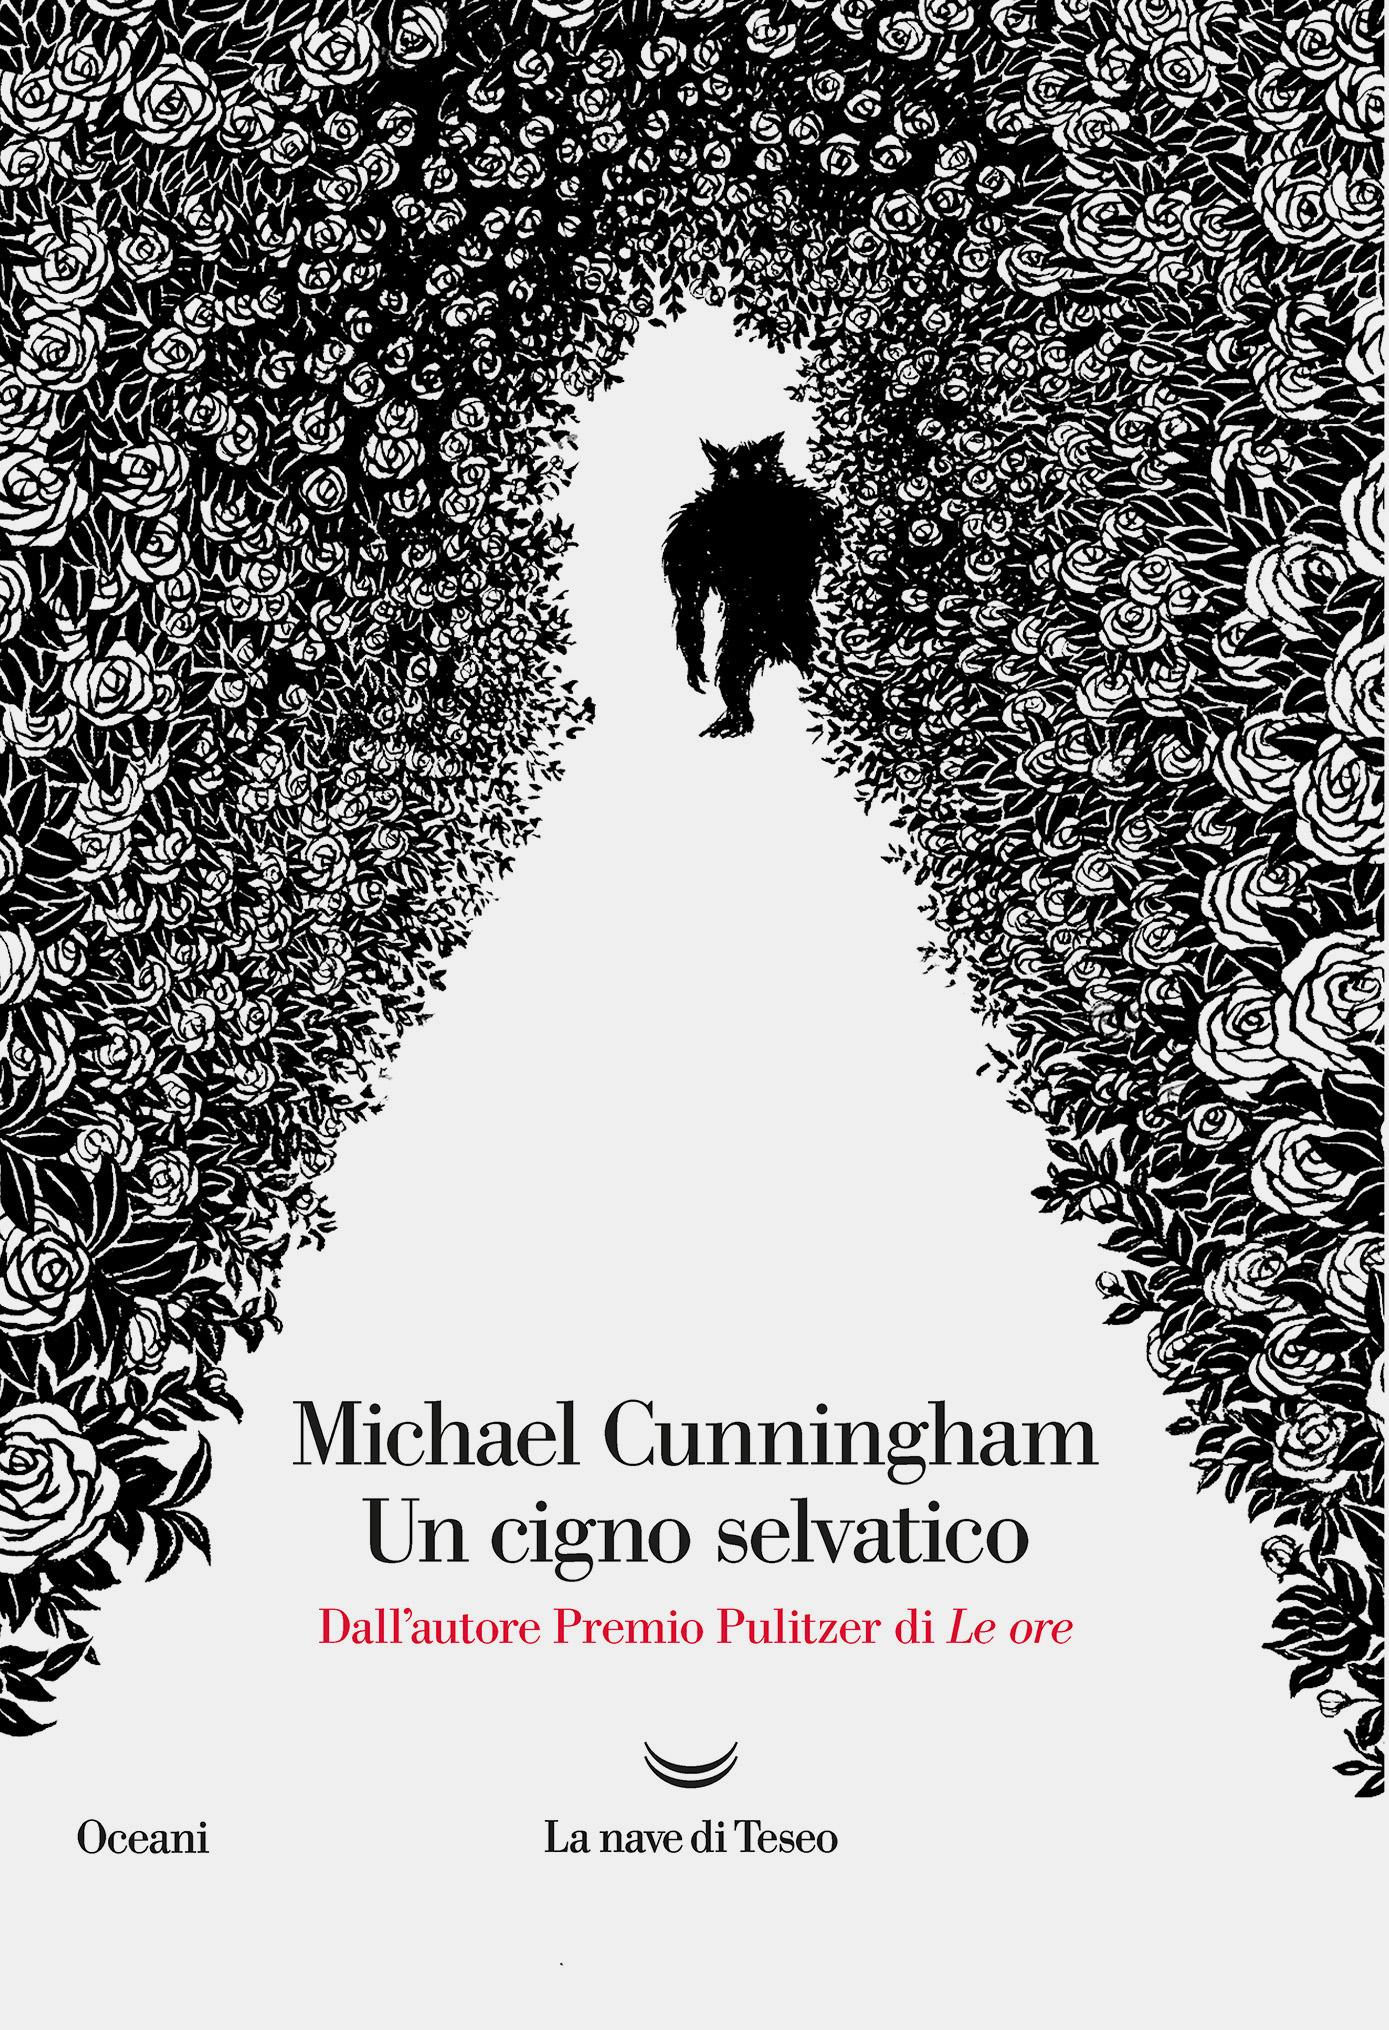 Michael Cunningham, Un cigno selvatico